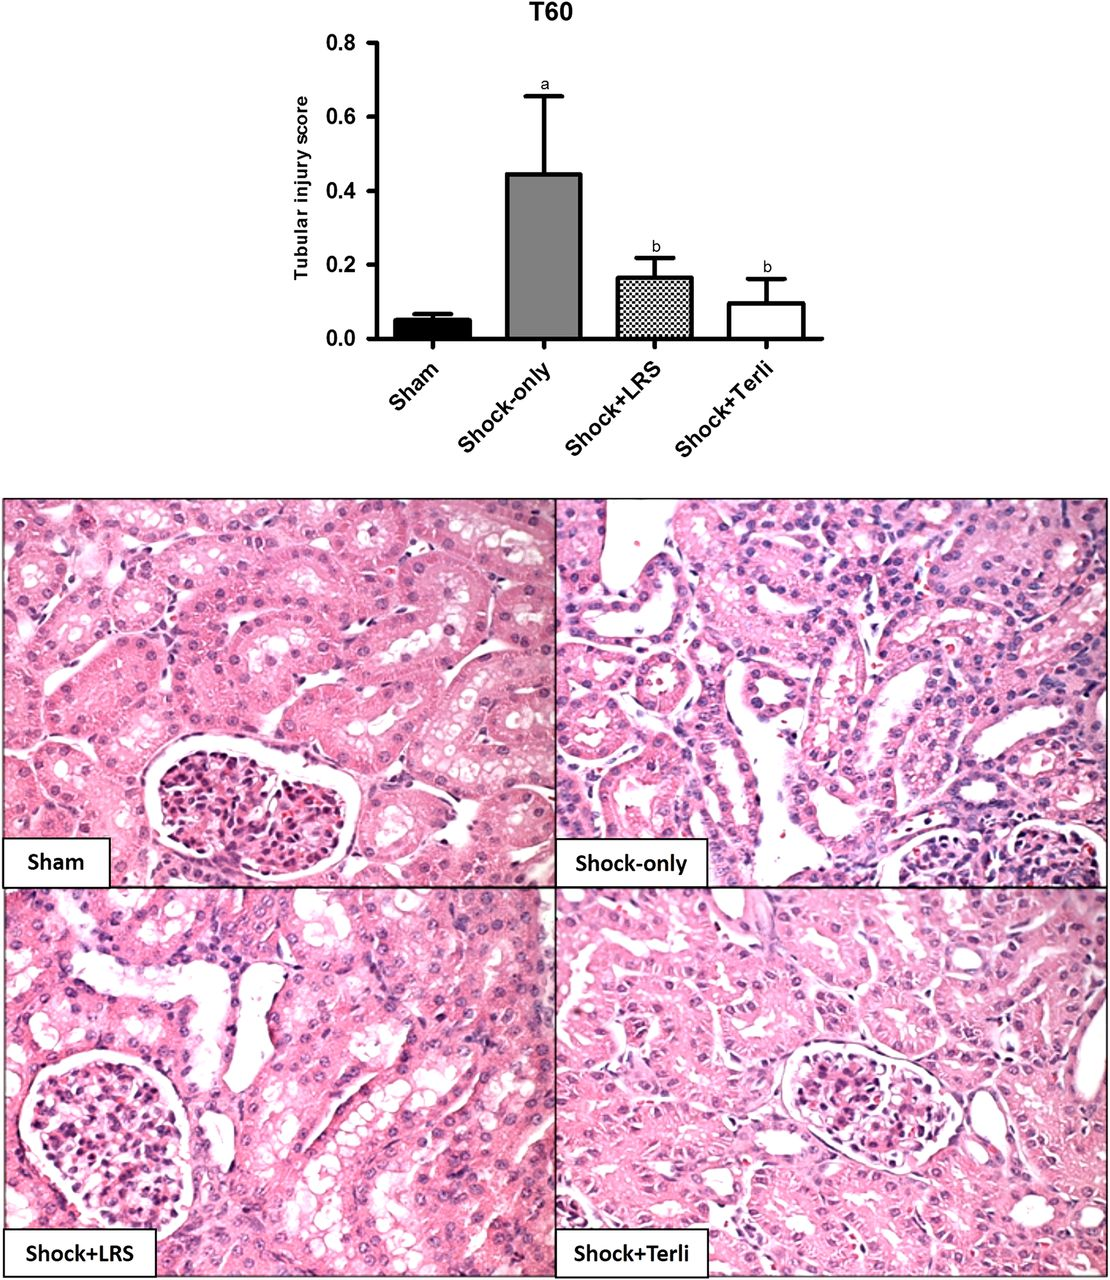 Vasopressin Analog Terlipressin Attenuates Kidney Injury In